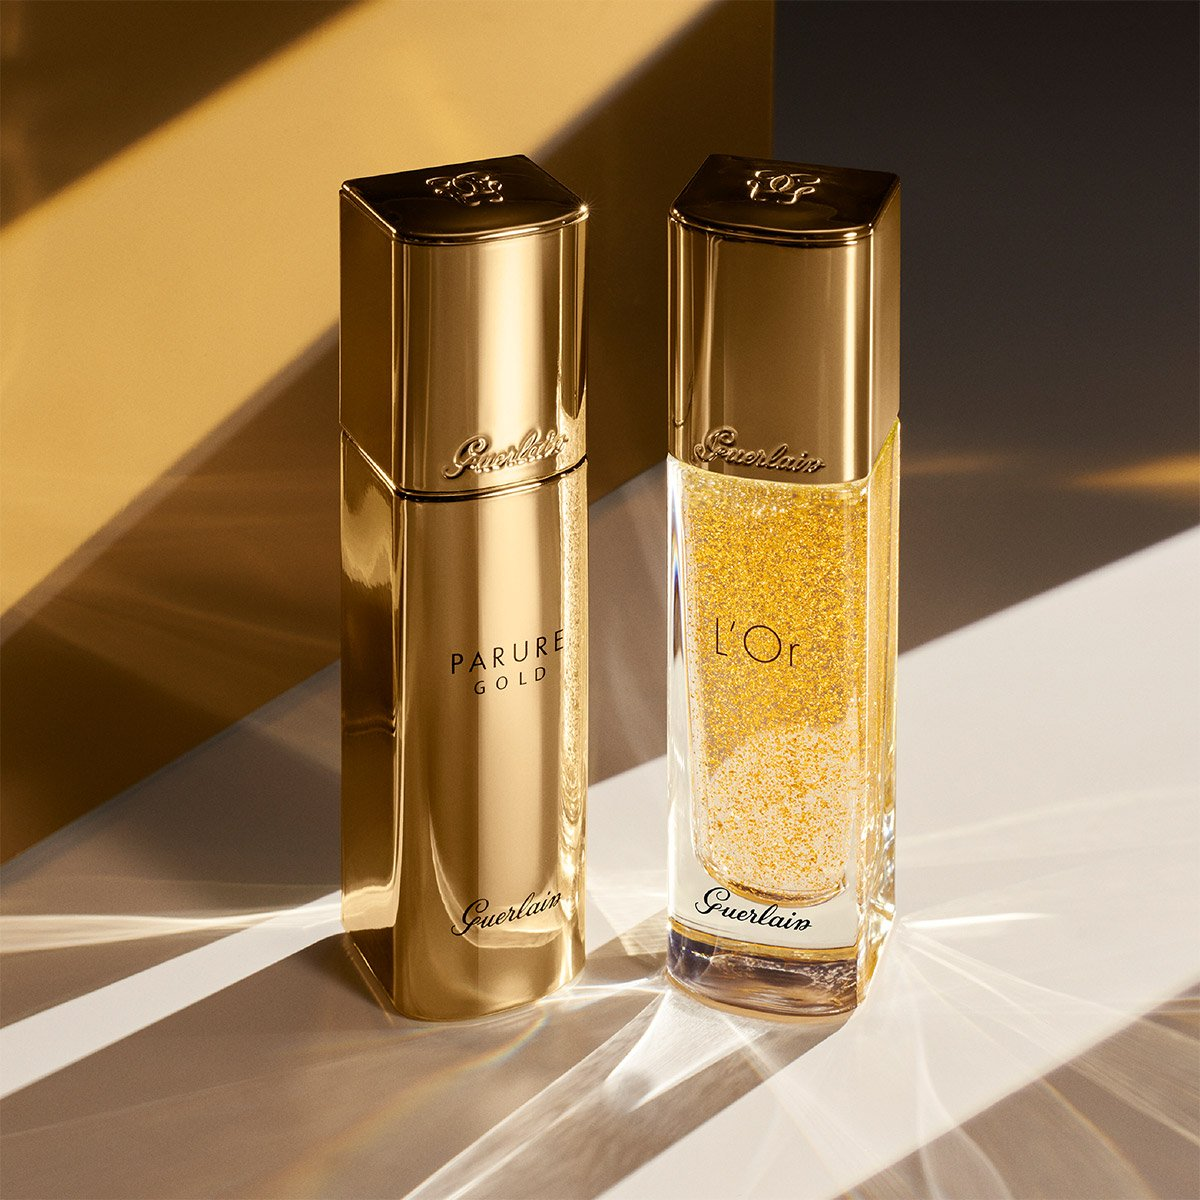 Base de Maquillaje Fluida Guerlain Parure Gold 02 Beige Clair 30 Ml